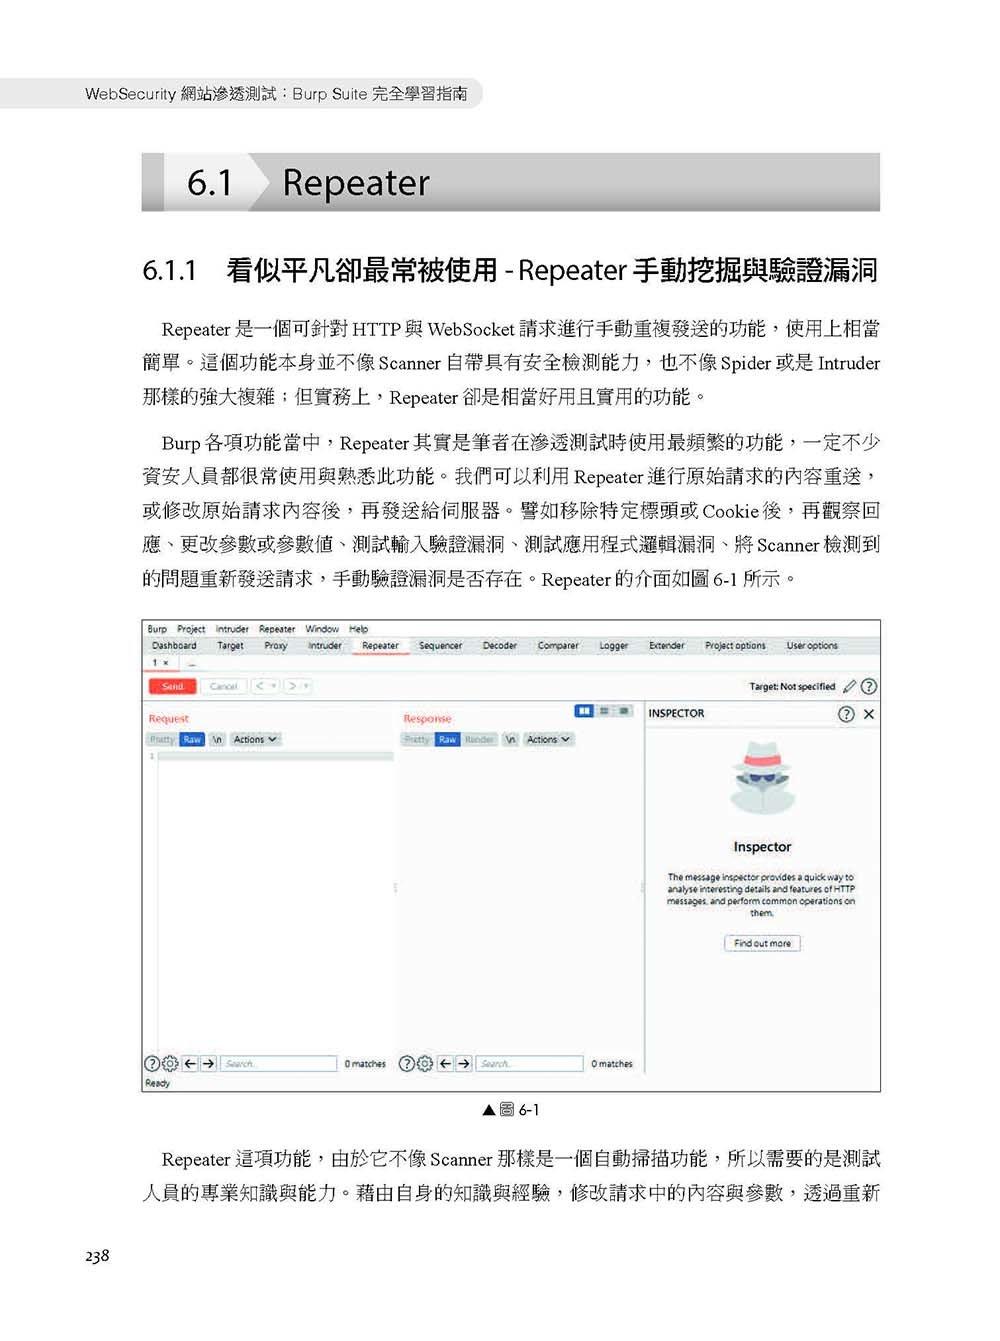 WebSecurity 網站滲透測試:Burp Suite 完全學習指南 (iT邦幫忙鐵人賽系列書)-preview-8